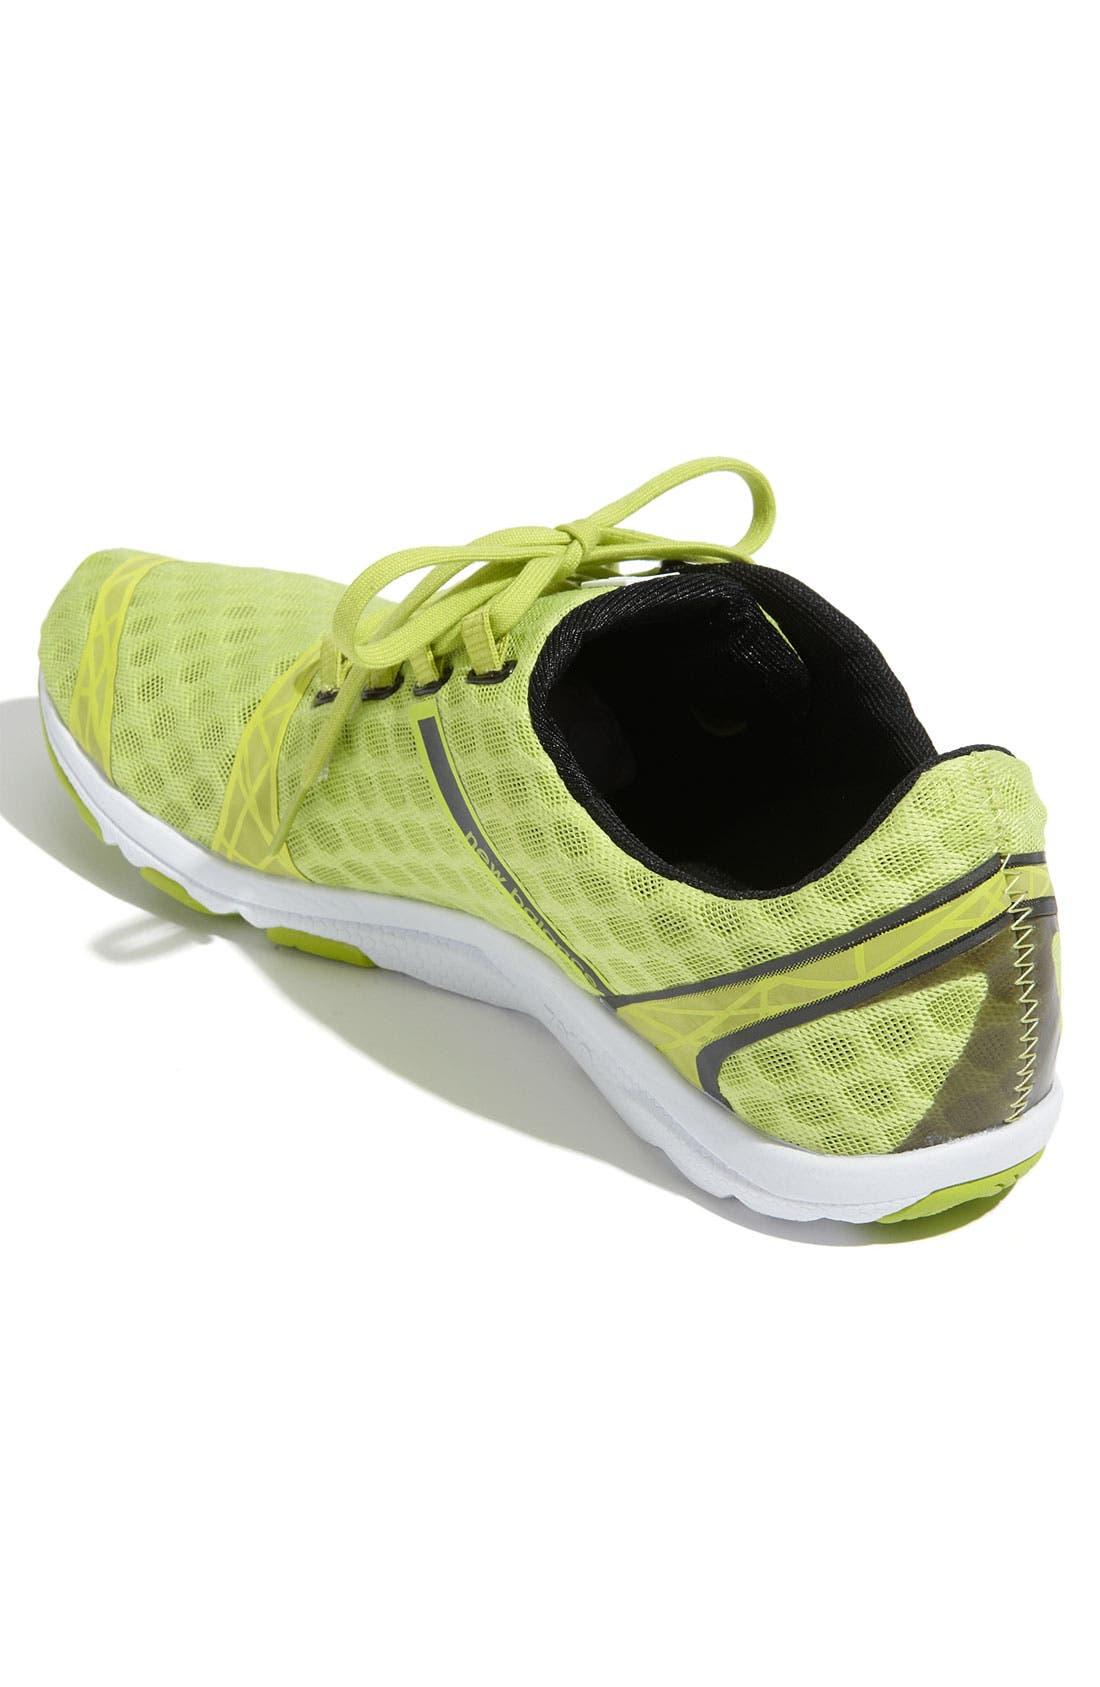 Alternate Image 2  - New Balance 'Minimus' Running Shoe (Men) (Online Only)